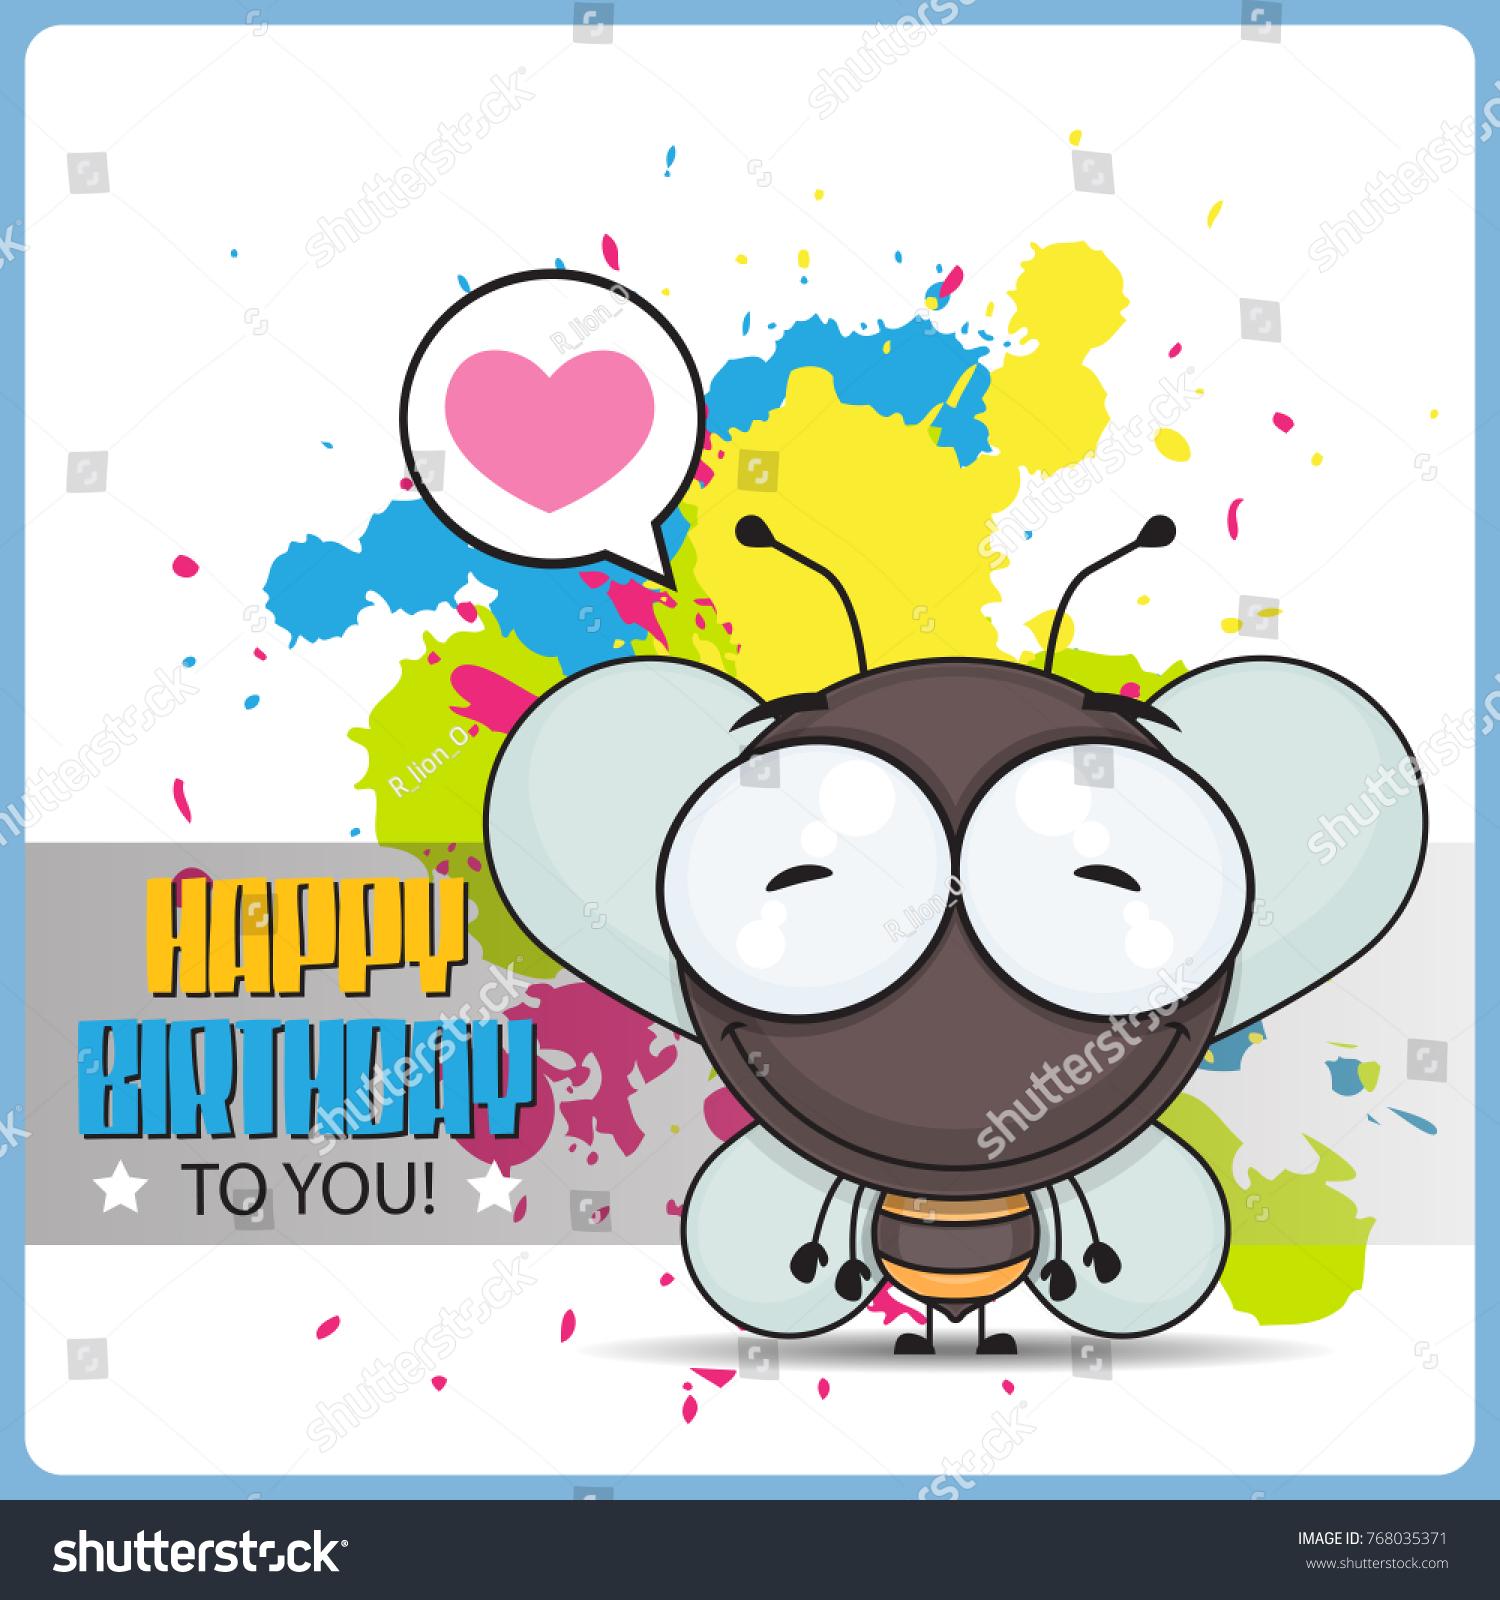 Funny happy birthday greeting card cartoon stock vector 768035371 funny happy birthday greeting card with cartoon bee character kristyandbryce Images